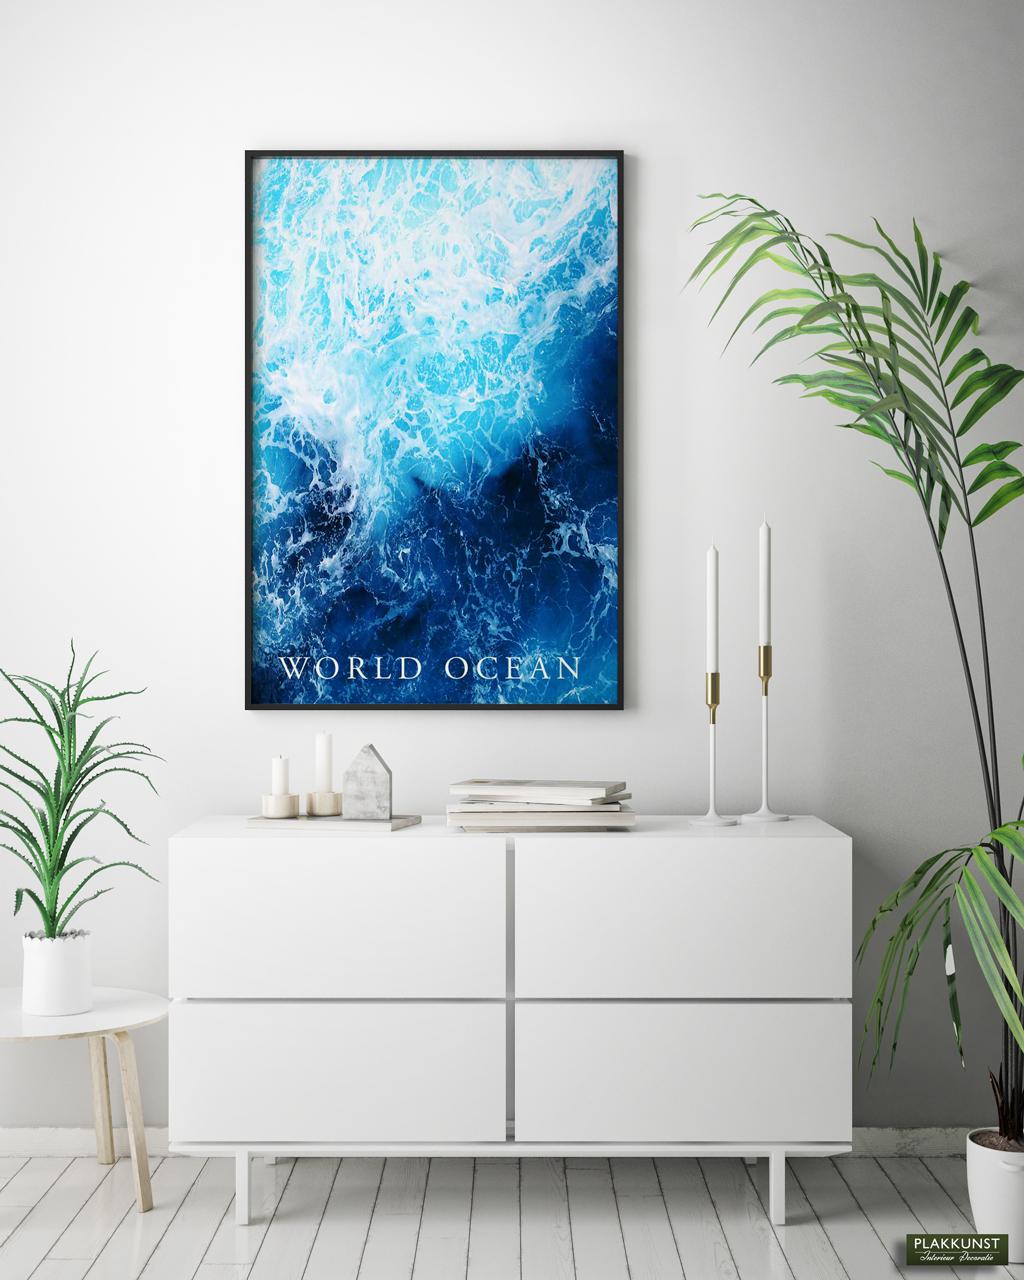 World Ocean, Poster